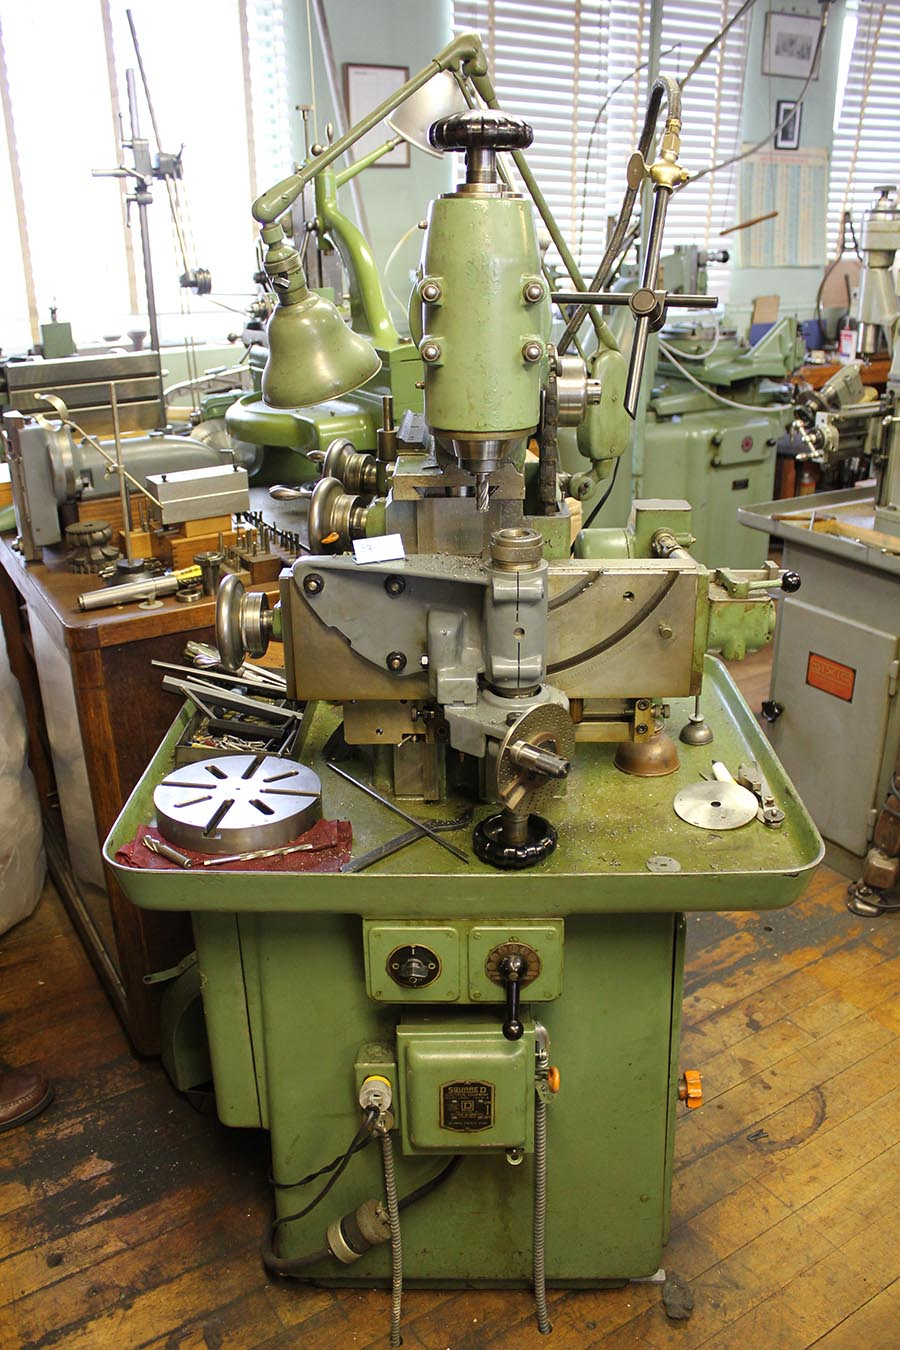 schaublin sv12 milling machine 171 memoria technica